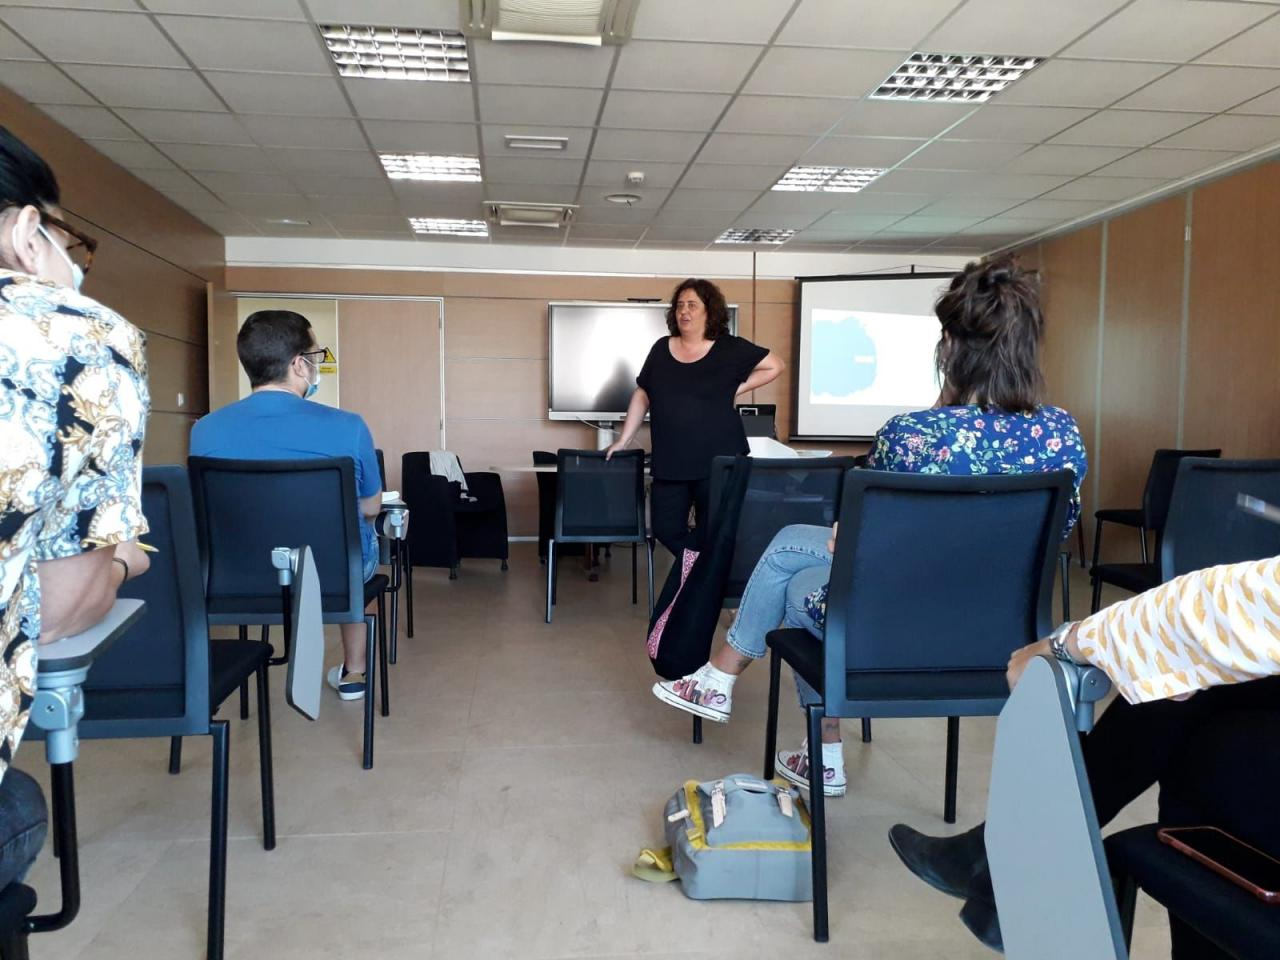 Nicole Haber impartiendo una charla en un centro educativo